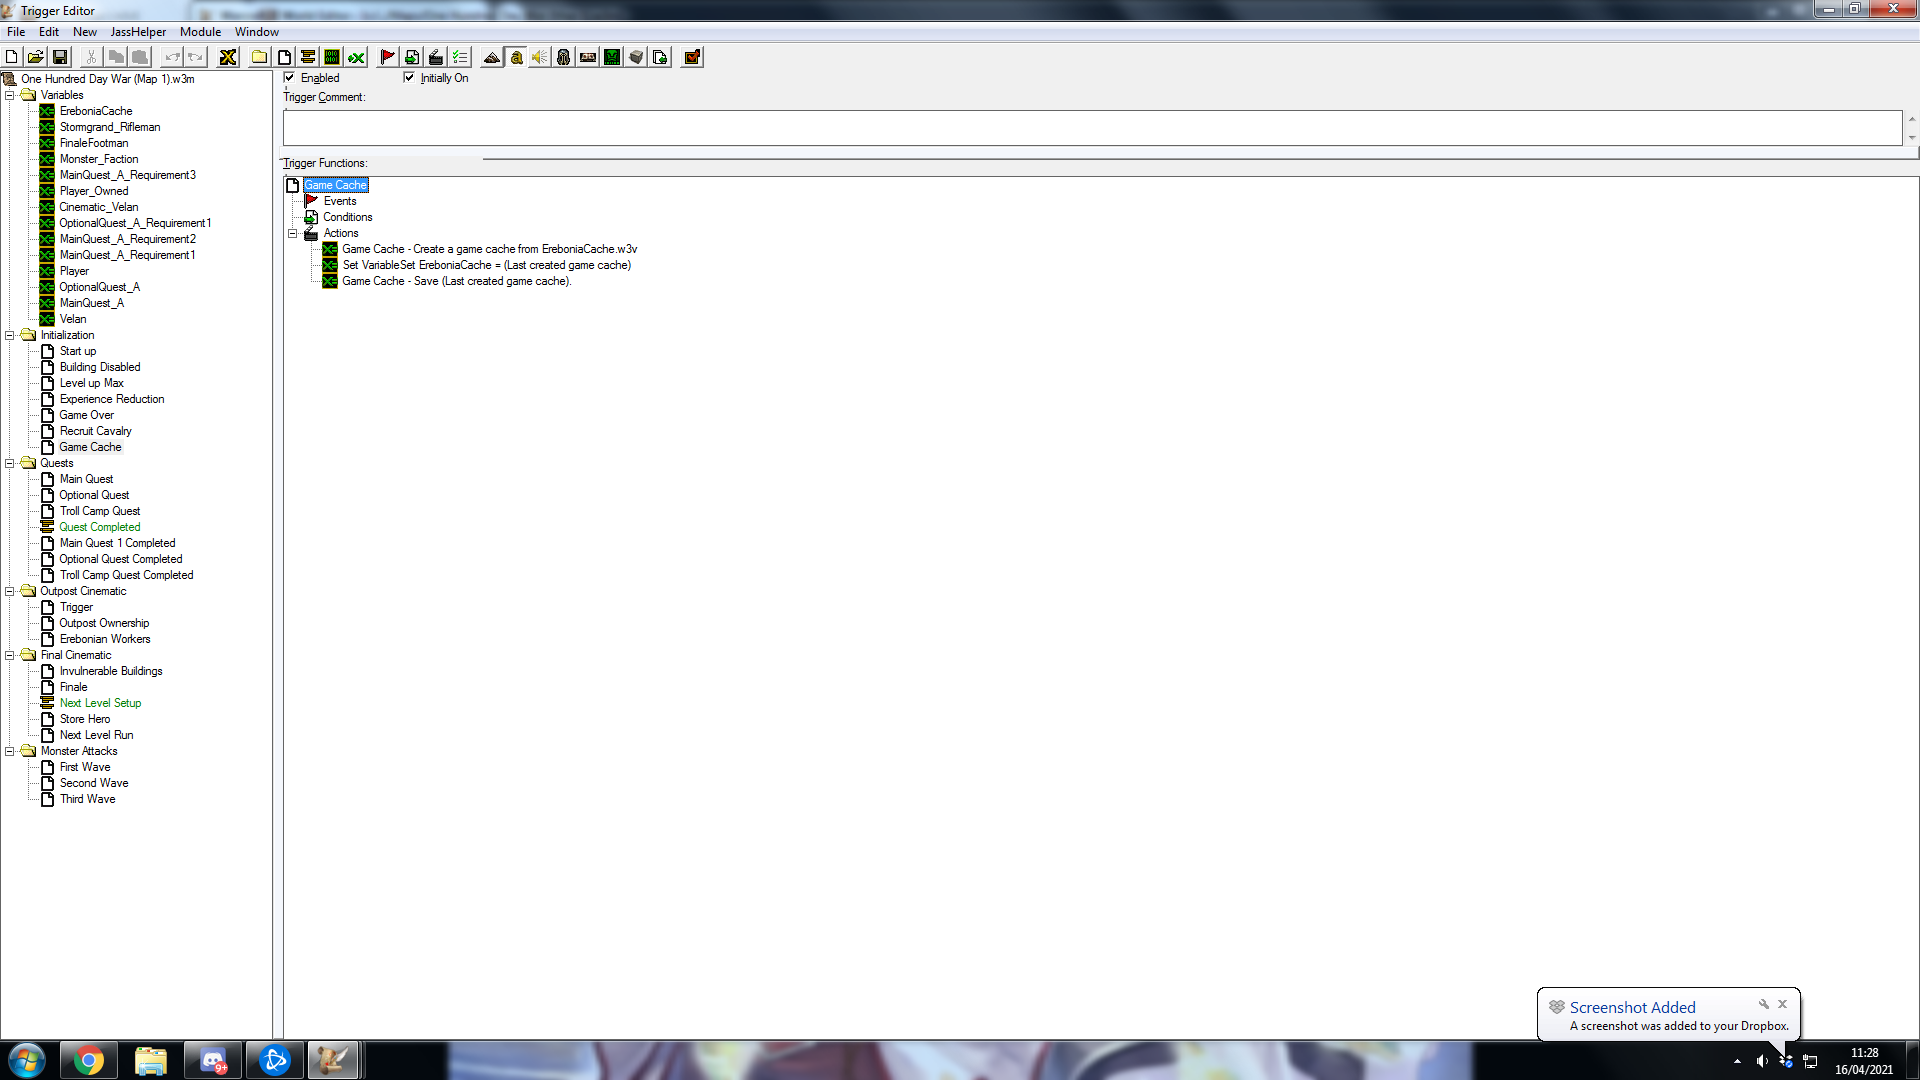 Screenshot 2021-04-16 11.28.52.png